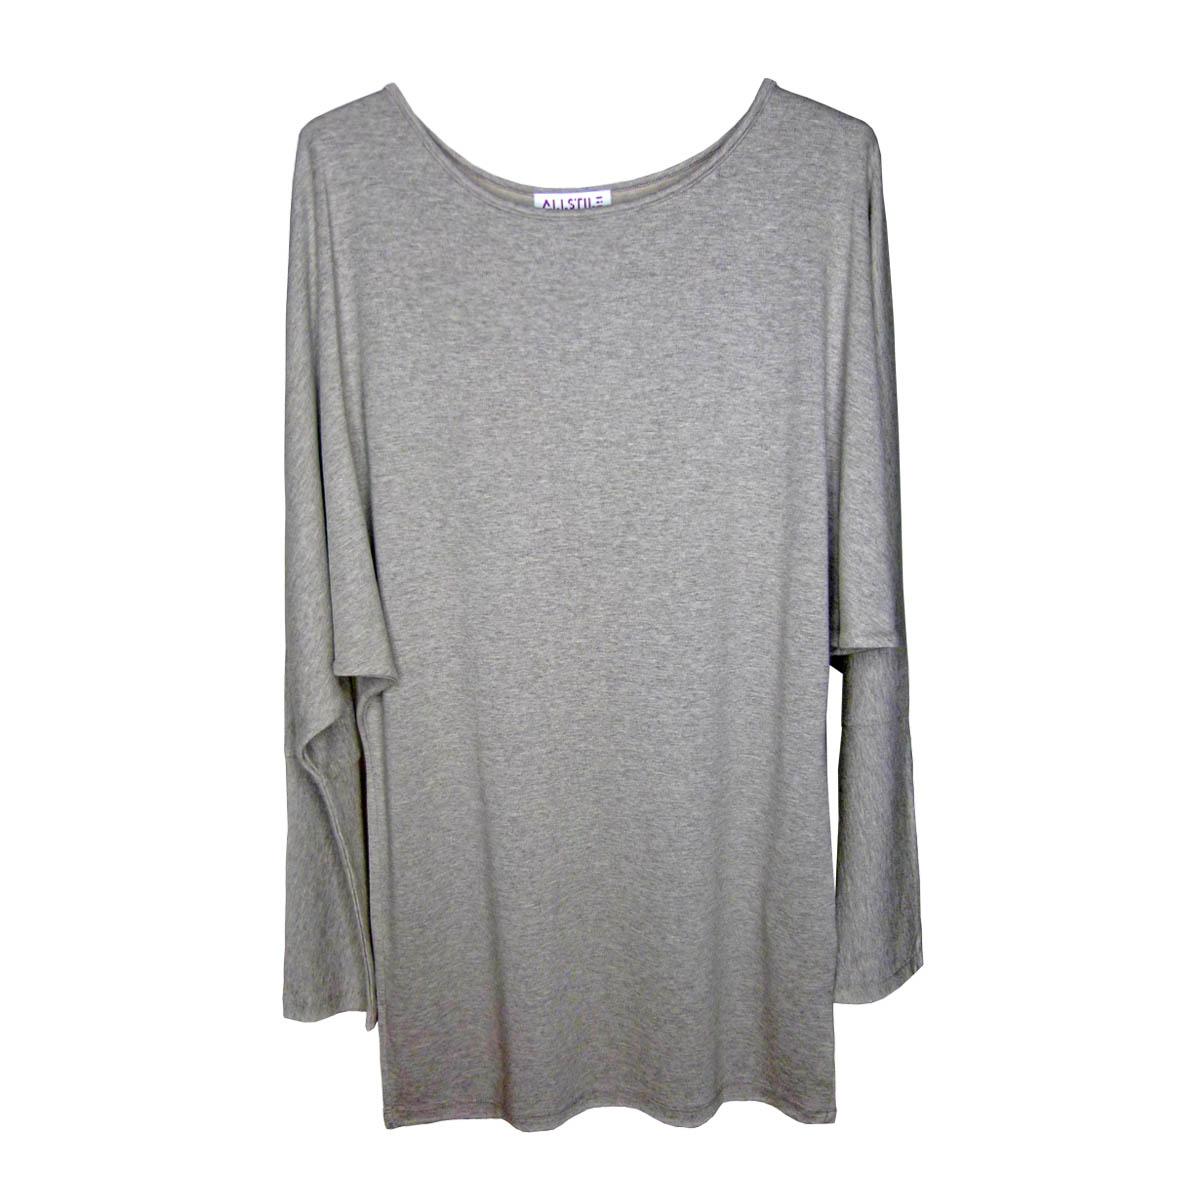 Clothing - Comfort-fit Bat Sleeve Dress - Grey - 01